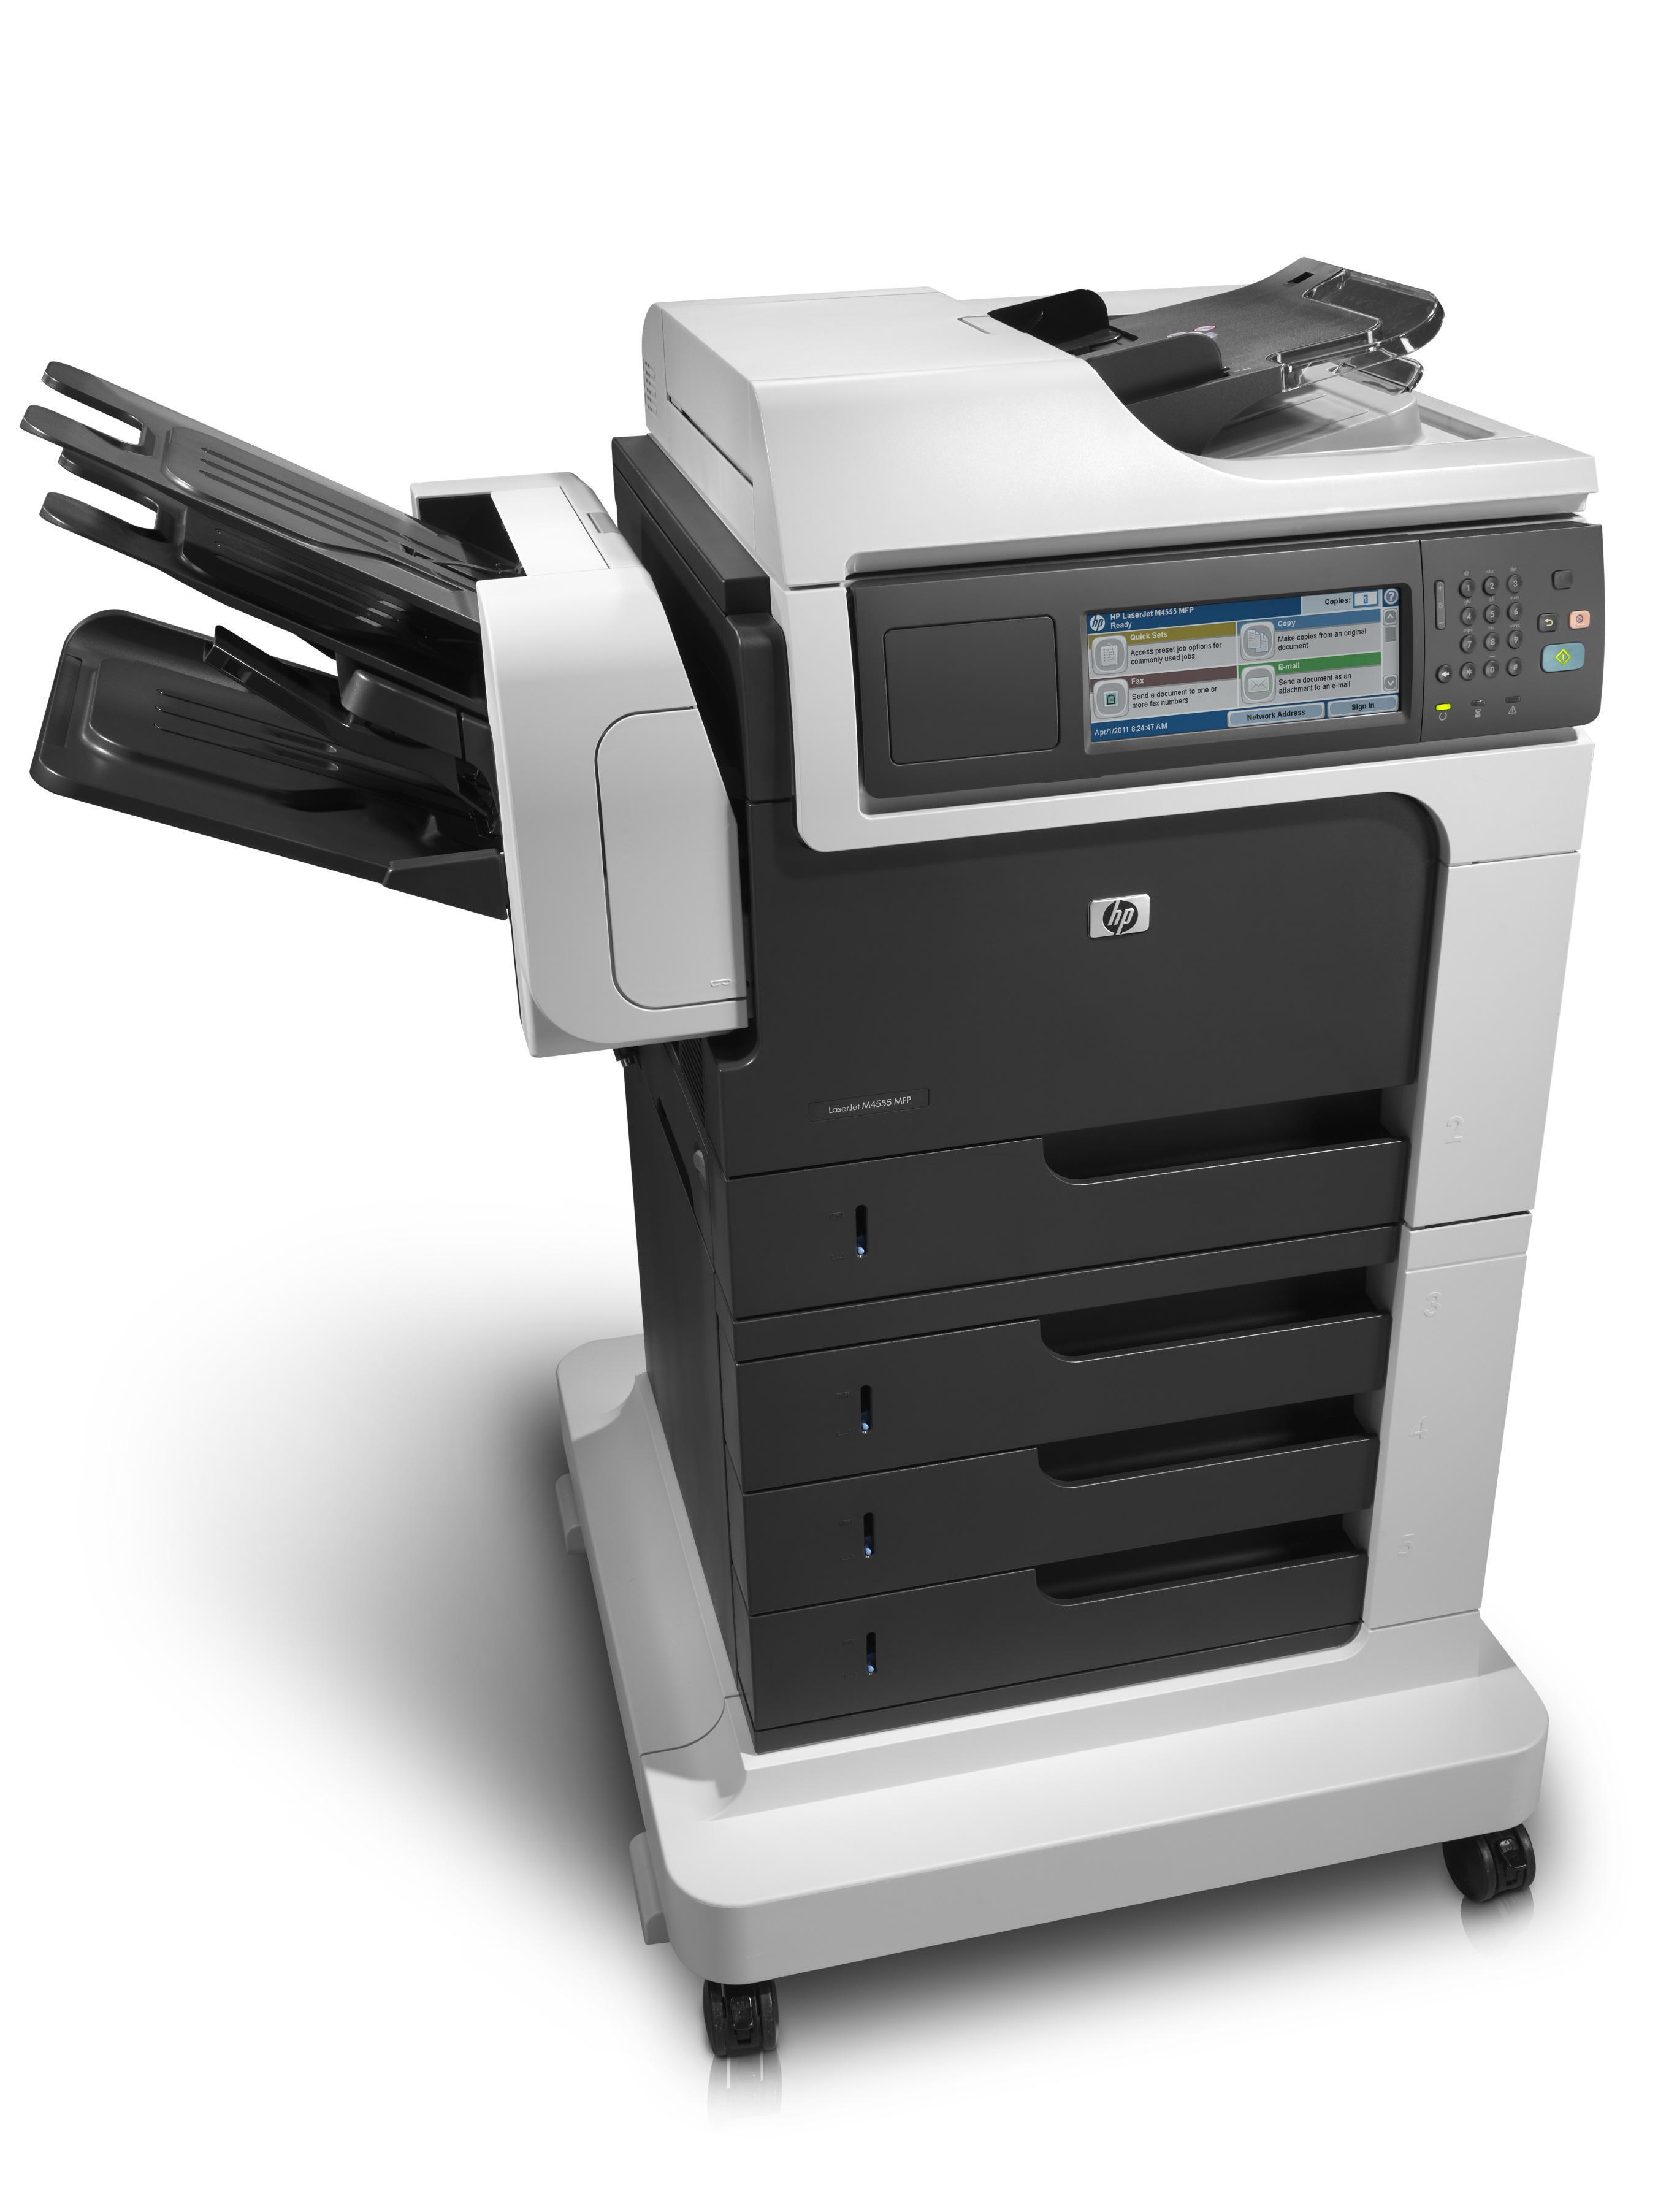 Hp M4555fskm Laserjet Enterprise Mfp Printer Reconditioned